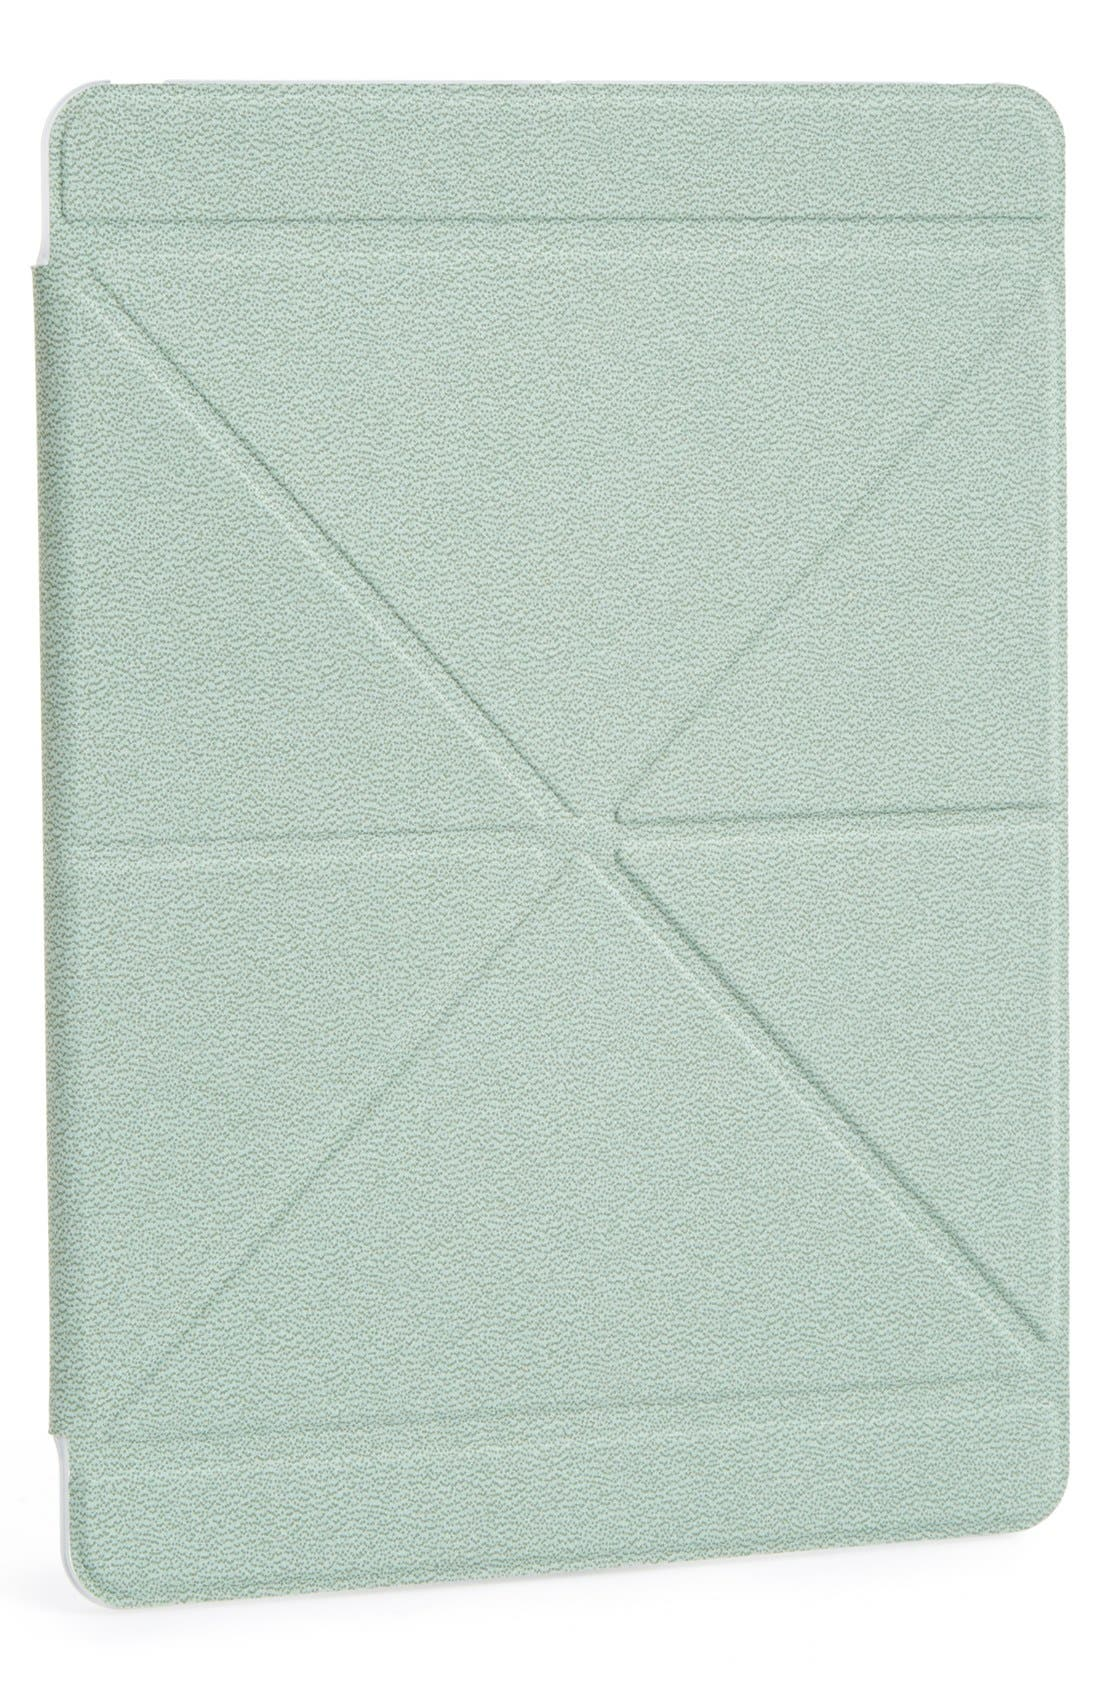 'VersaCover' iPad Air Cover,                         Main,                         color, 300